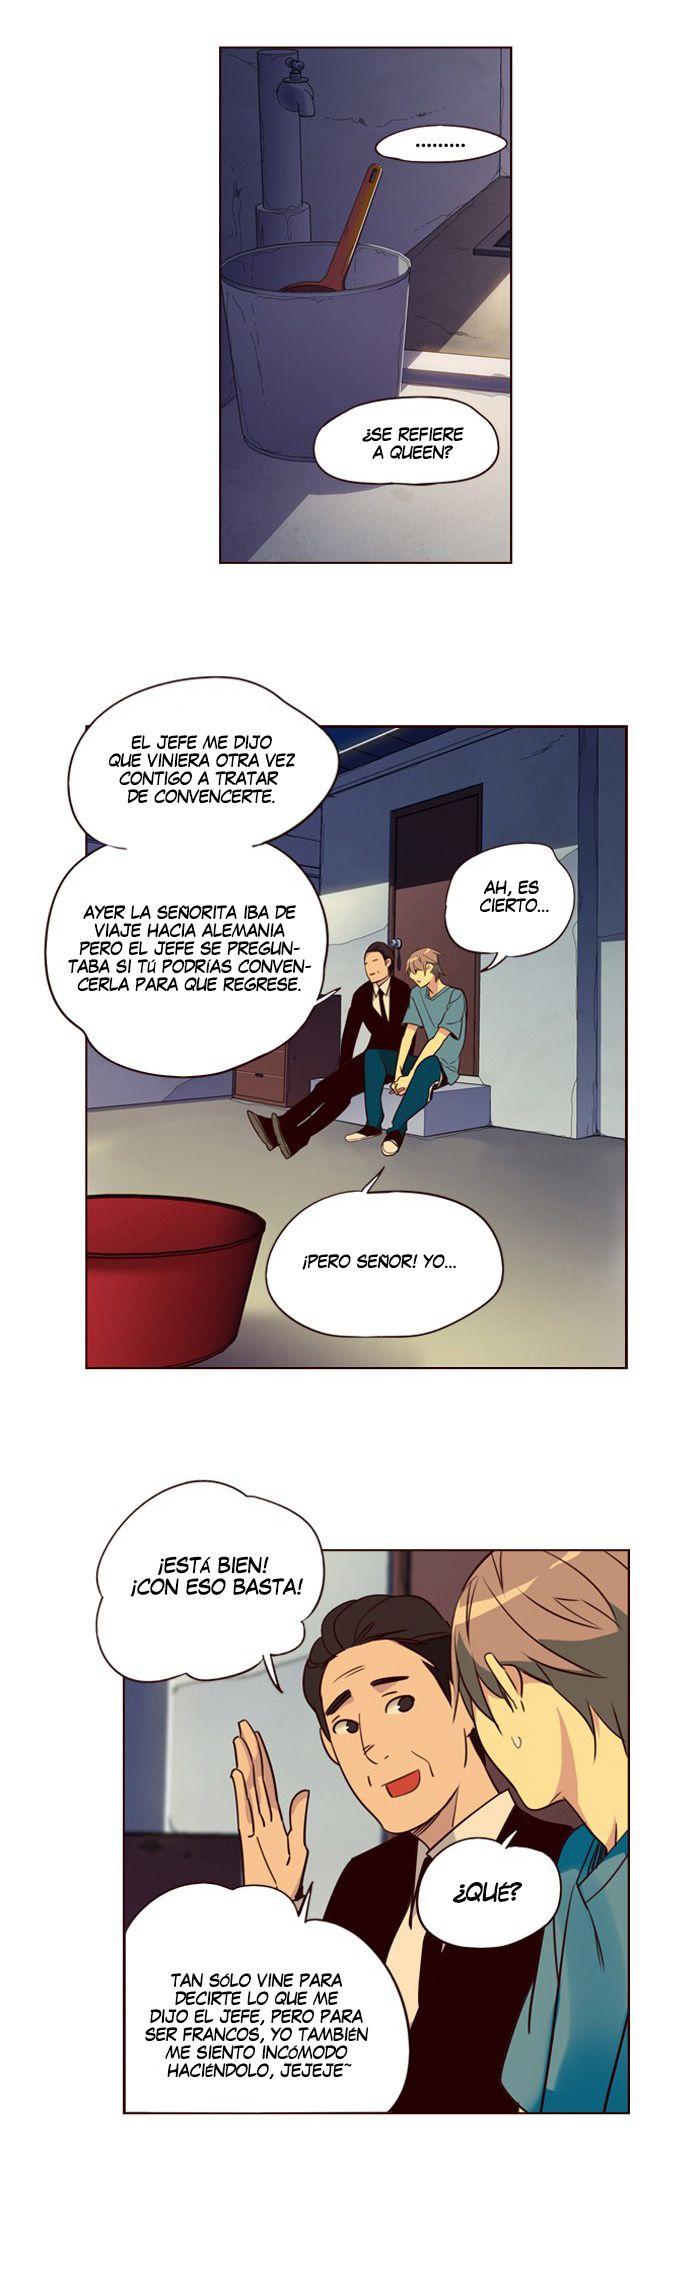 http://c5.ninemanga.com/es_manga/32/416/485306/19c7ee170cf96b14c1e75b3eebfcb56d.jpg Page 8